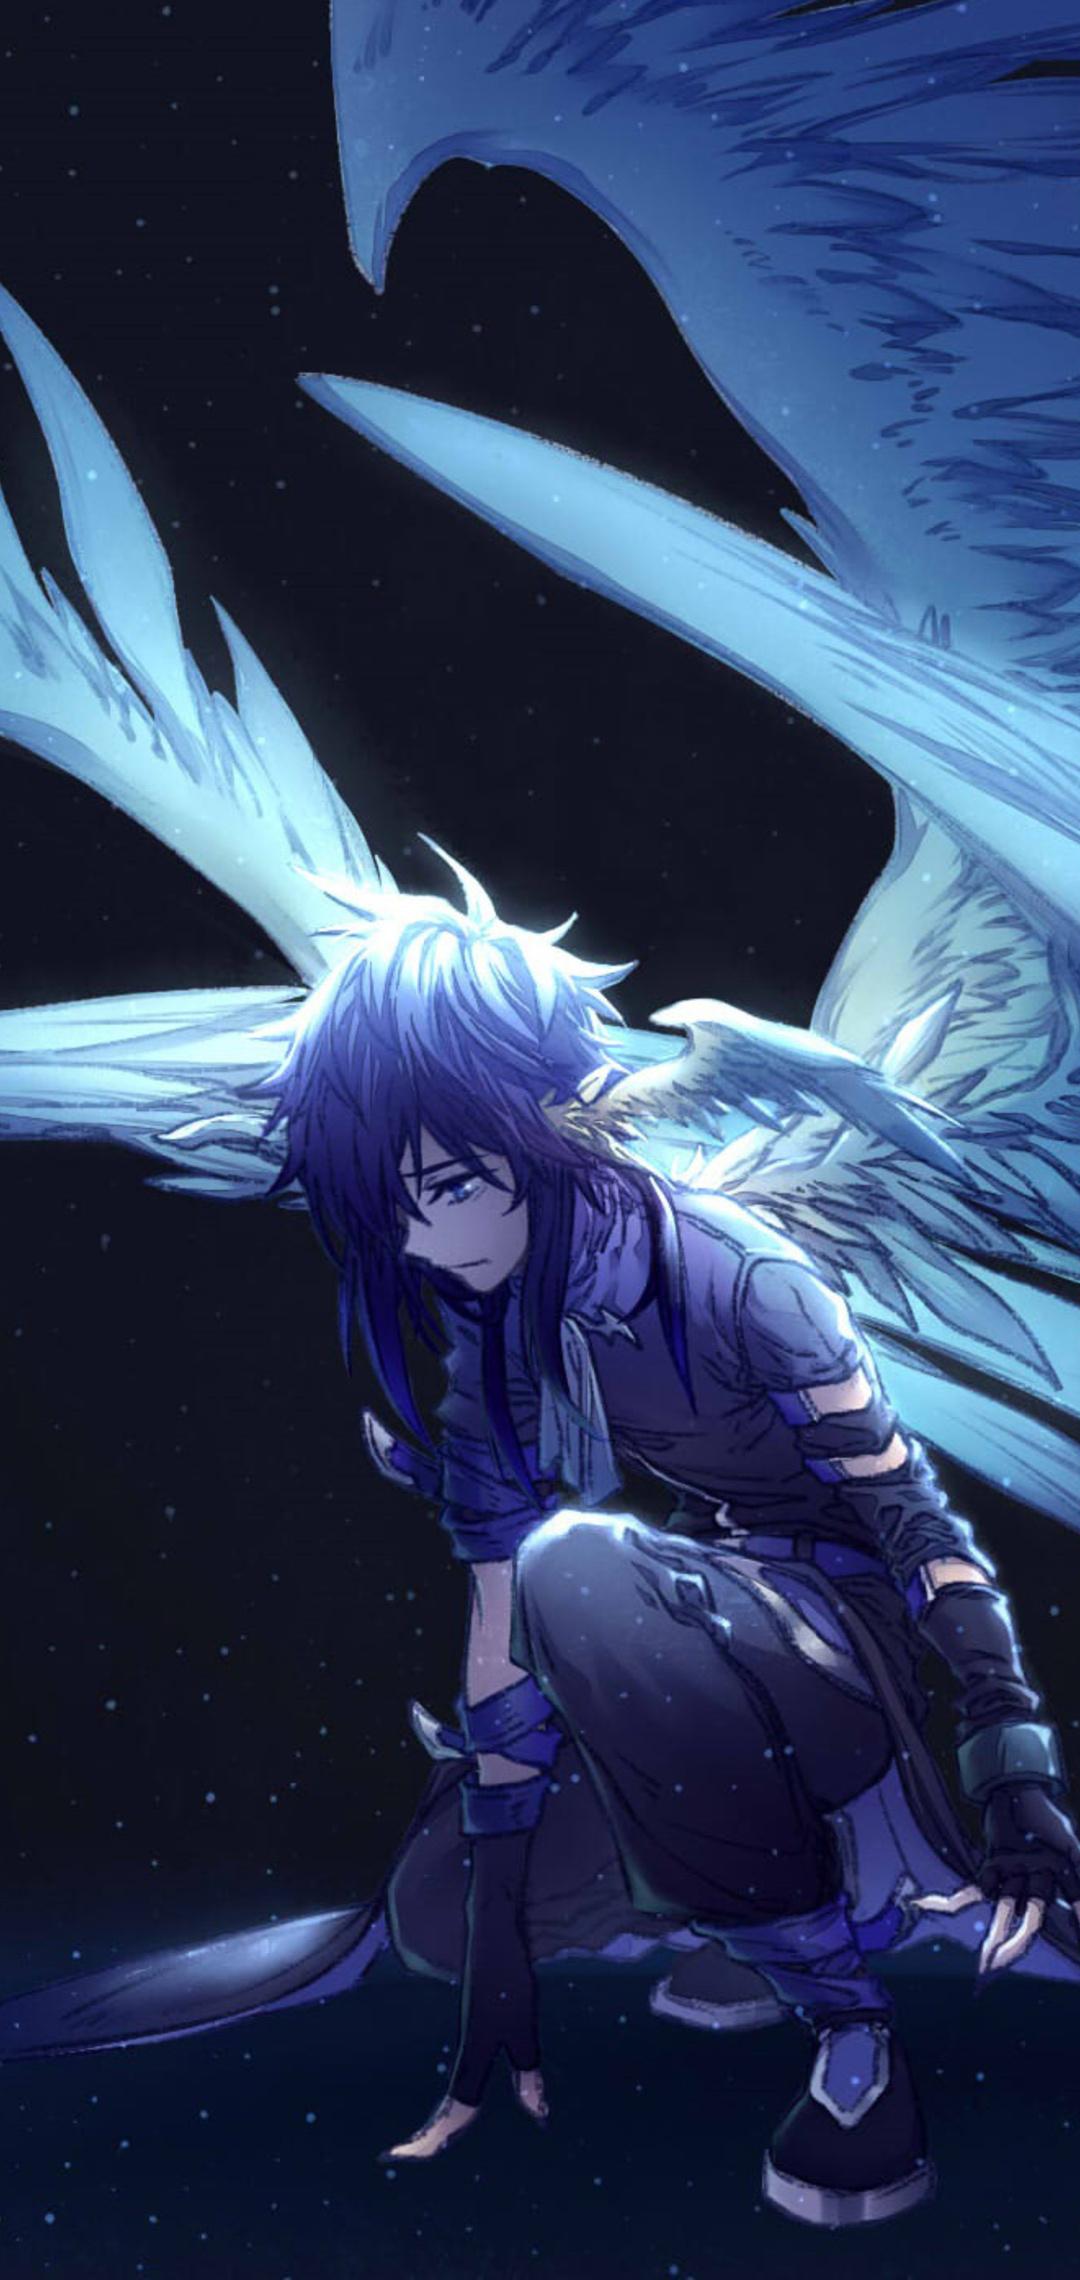 Arsh 3d Wallpaper 1080x2280 Angel Anime One Plus 6 Huawei P20 Honor View 10